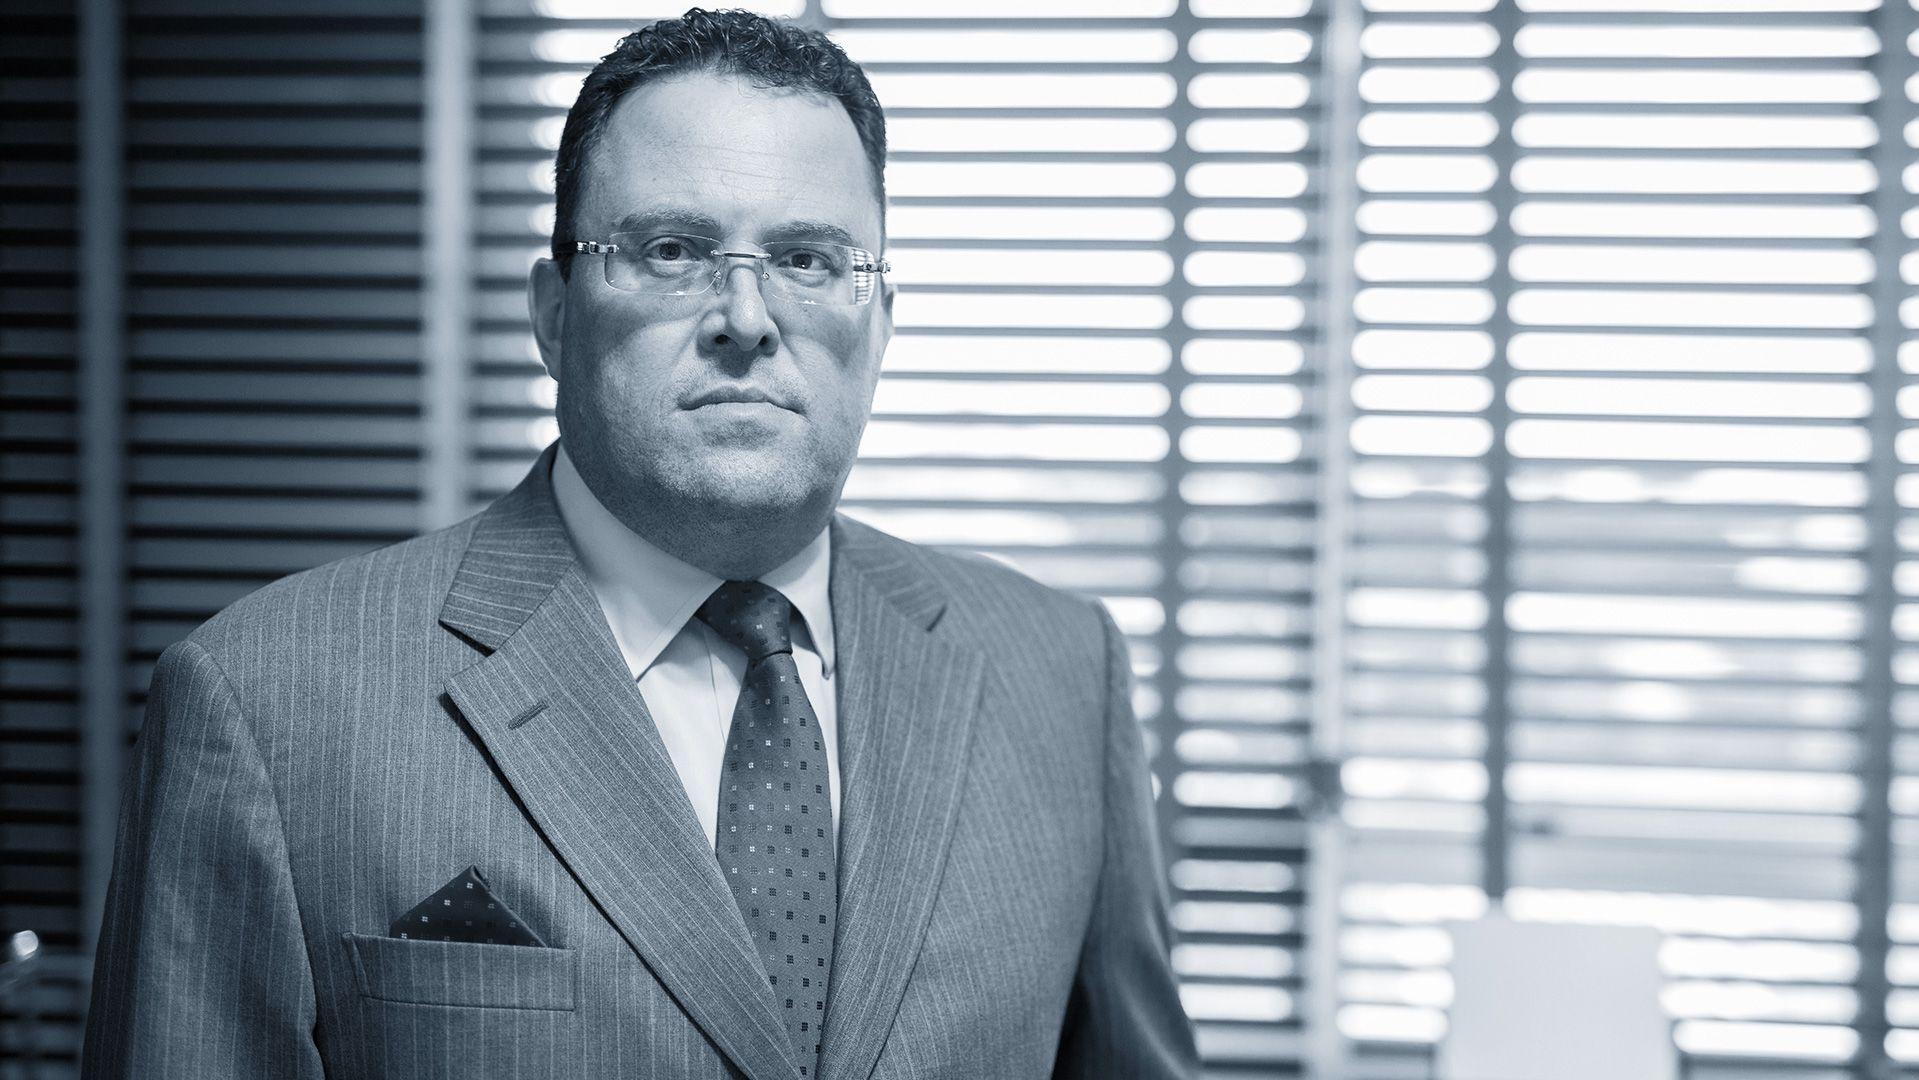 Celso Justus Advogado Trabalista